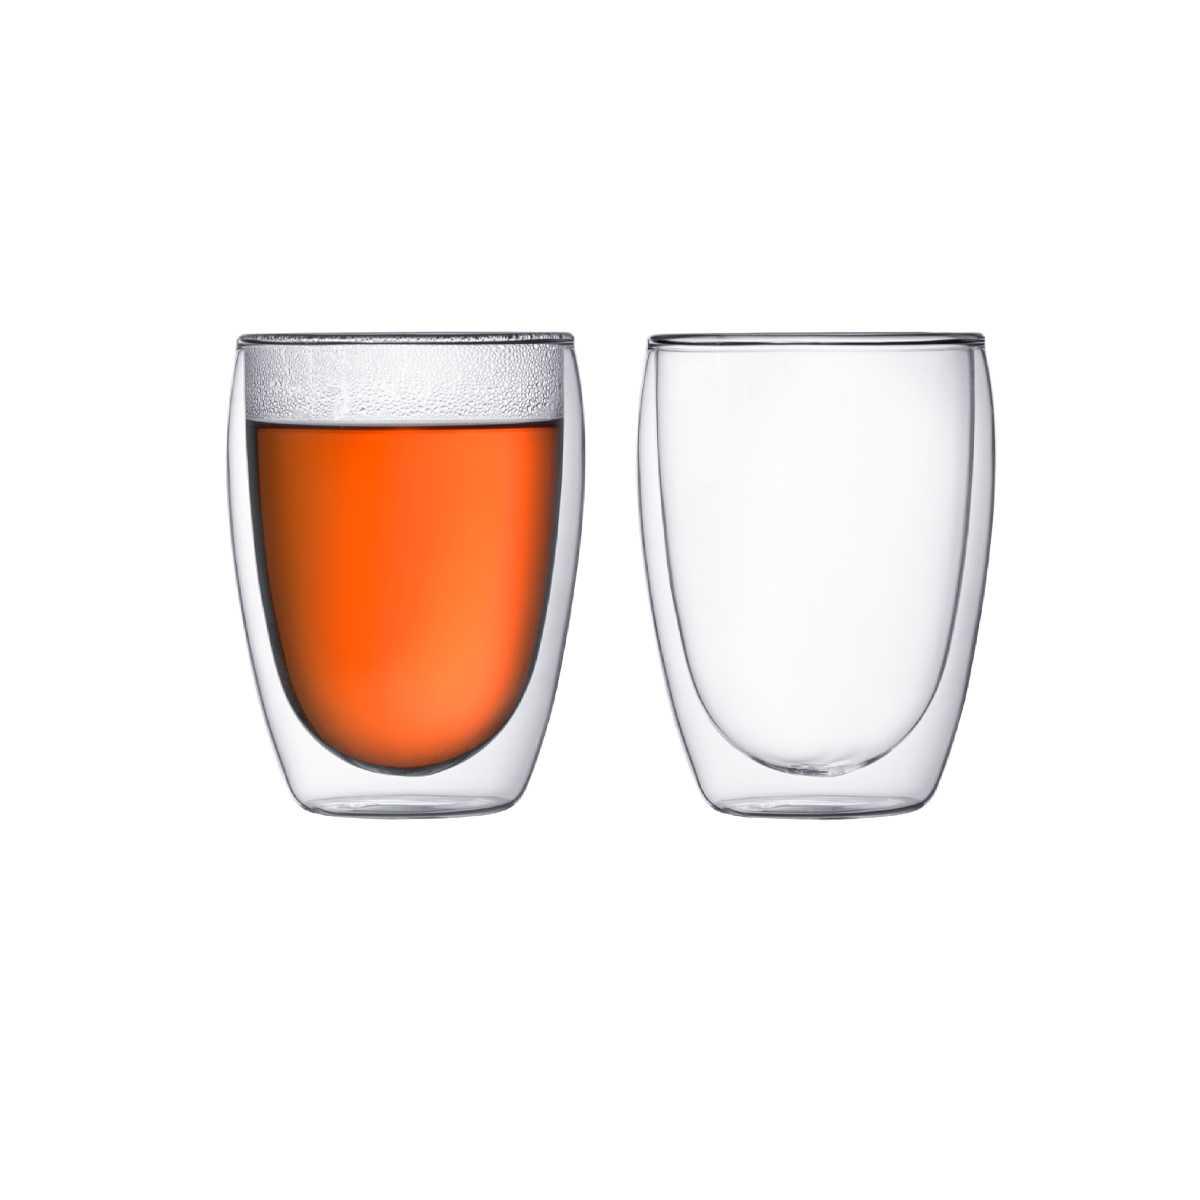 Онлайн каталог PROMENU: Набор стаканов с двойными стенками Bodum, 0,35 л, 2 шт. Bodum 4559-10